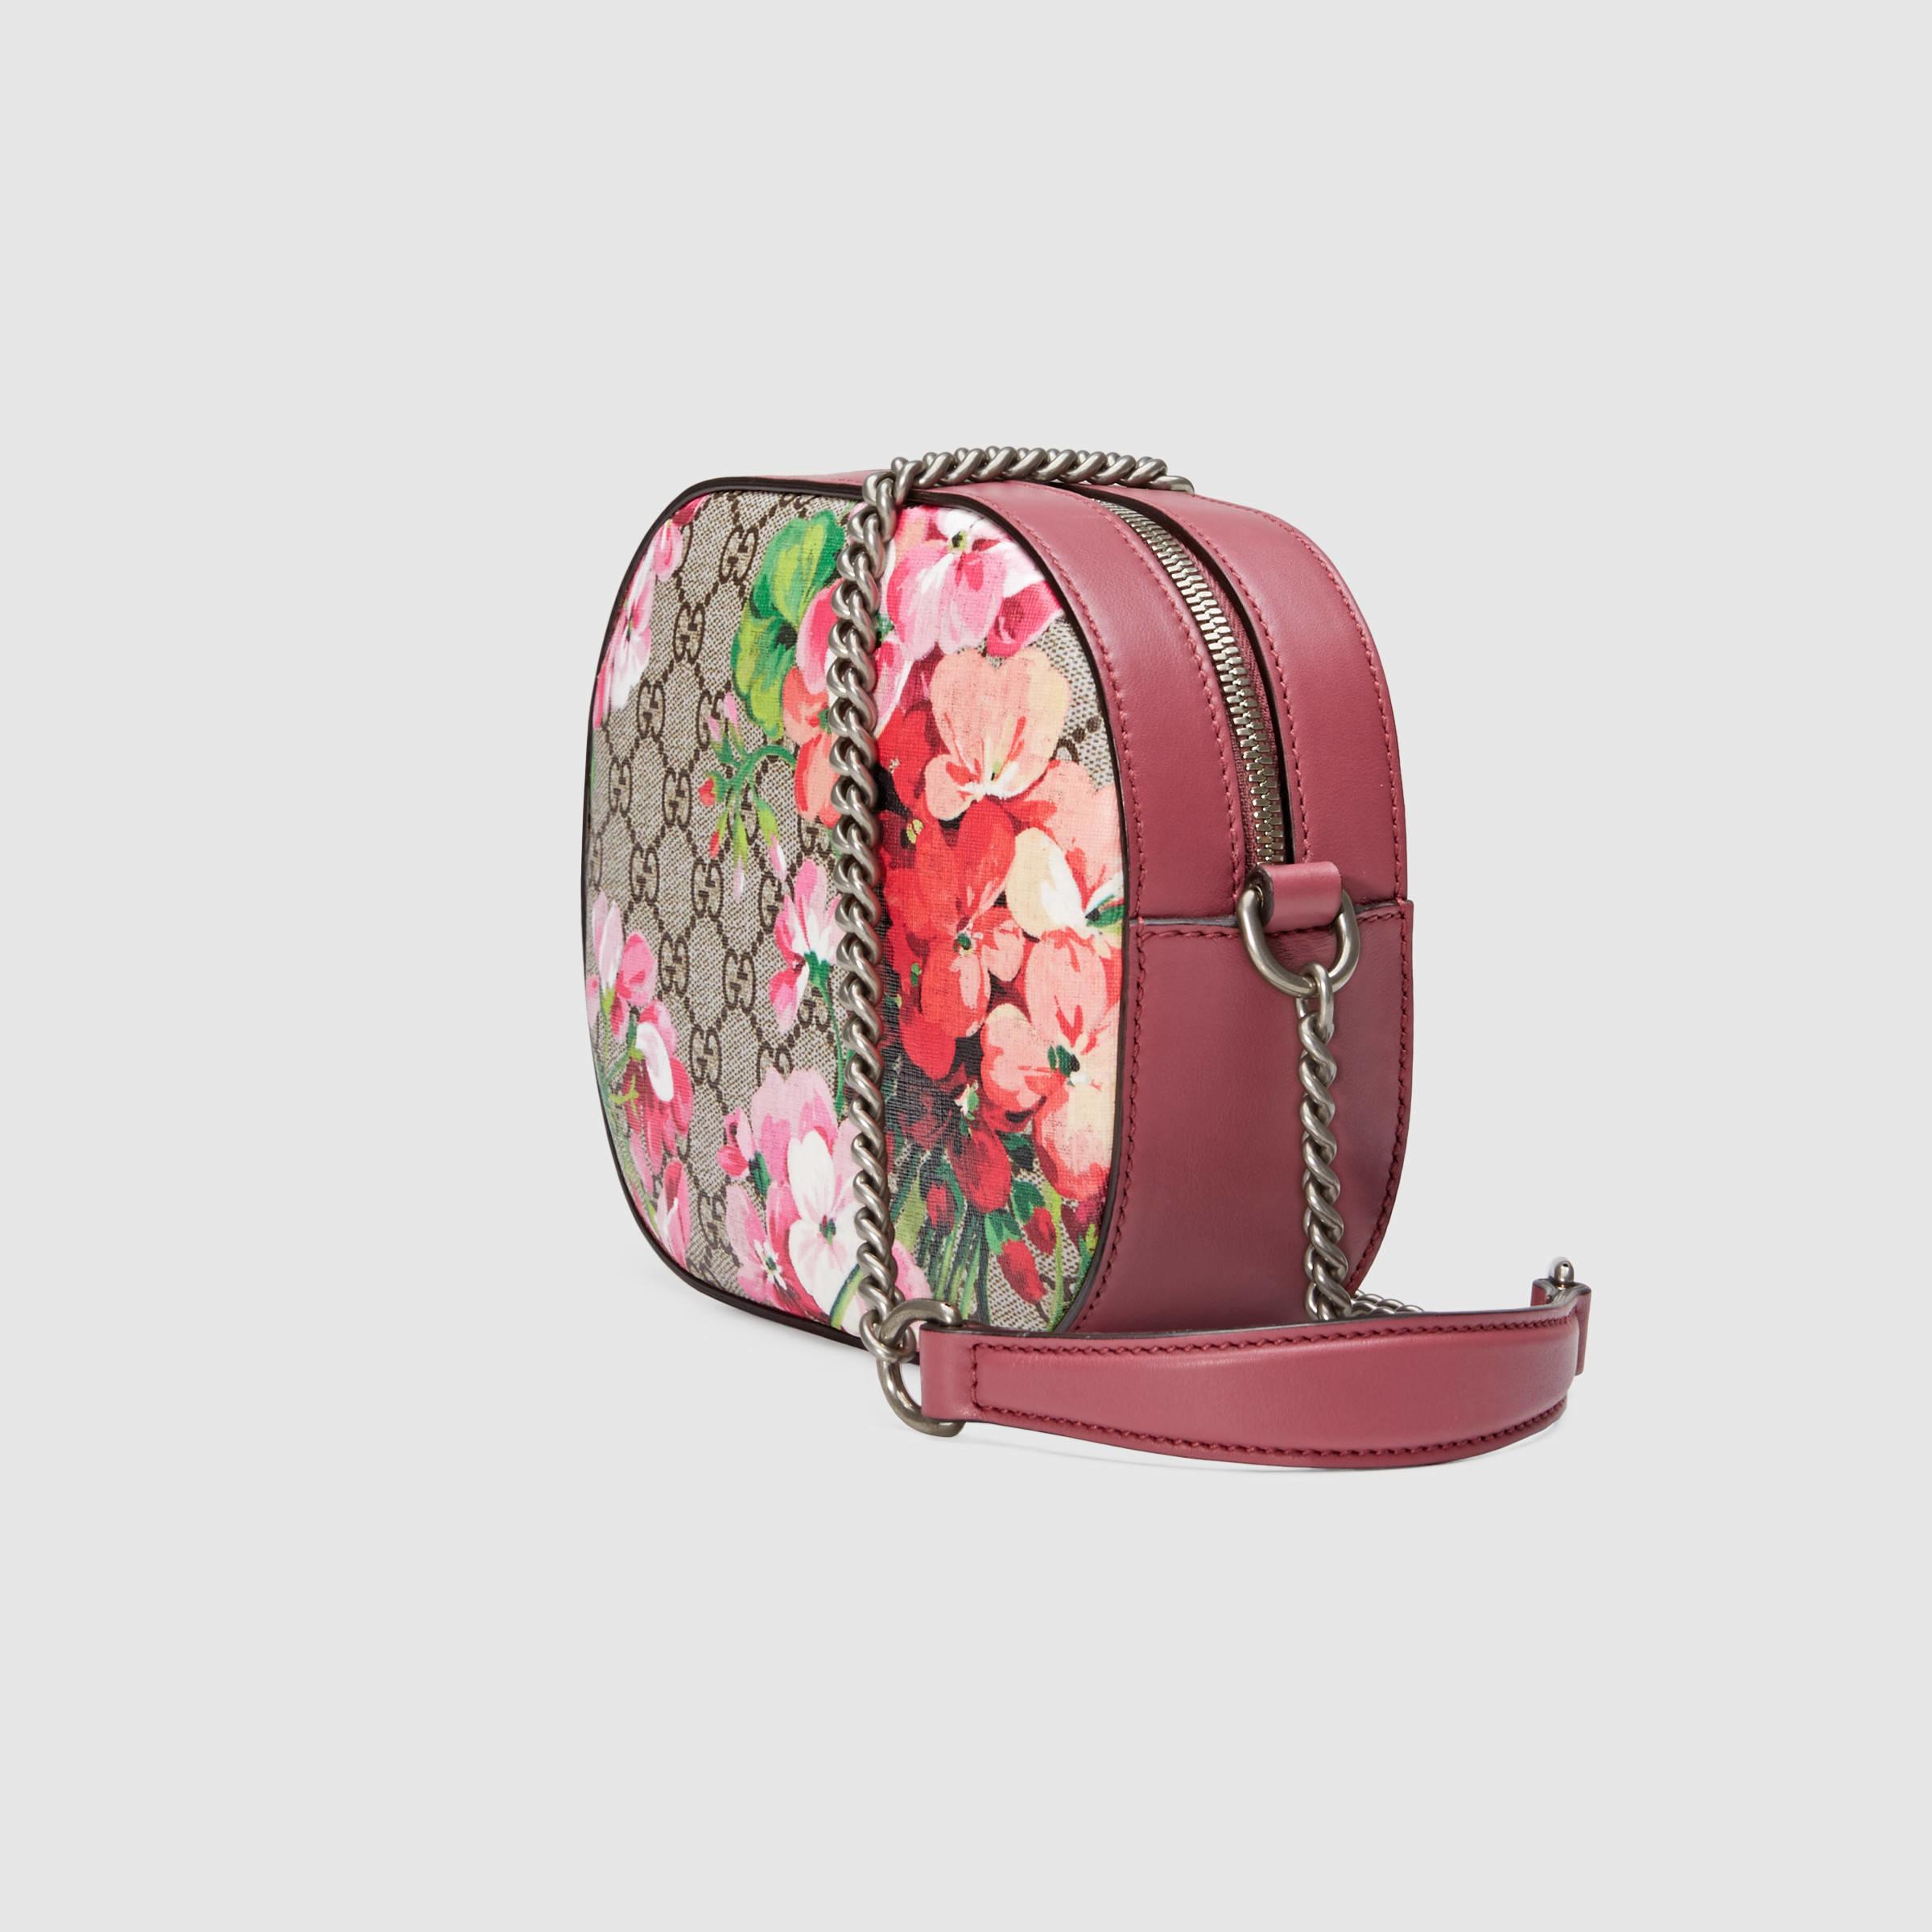 dff40d409f89c3 Gucci Blooms GG Supreme Mini Chain Shoulder Bag - Lyst